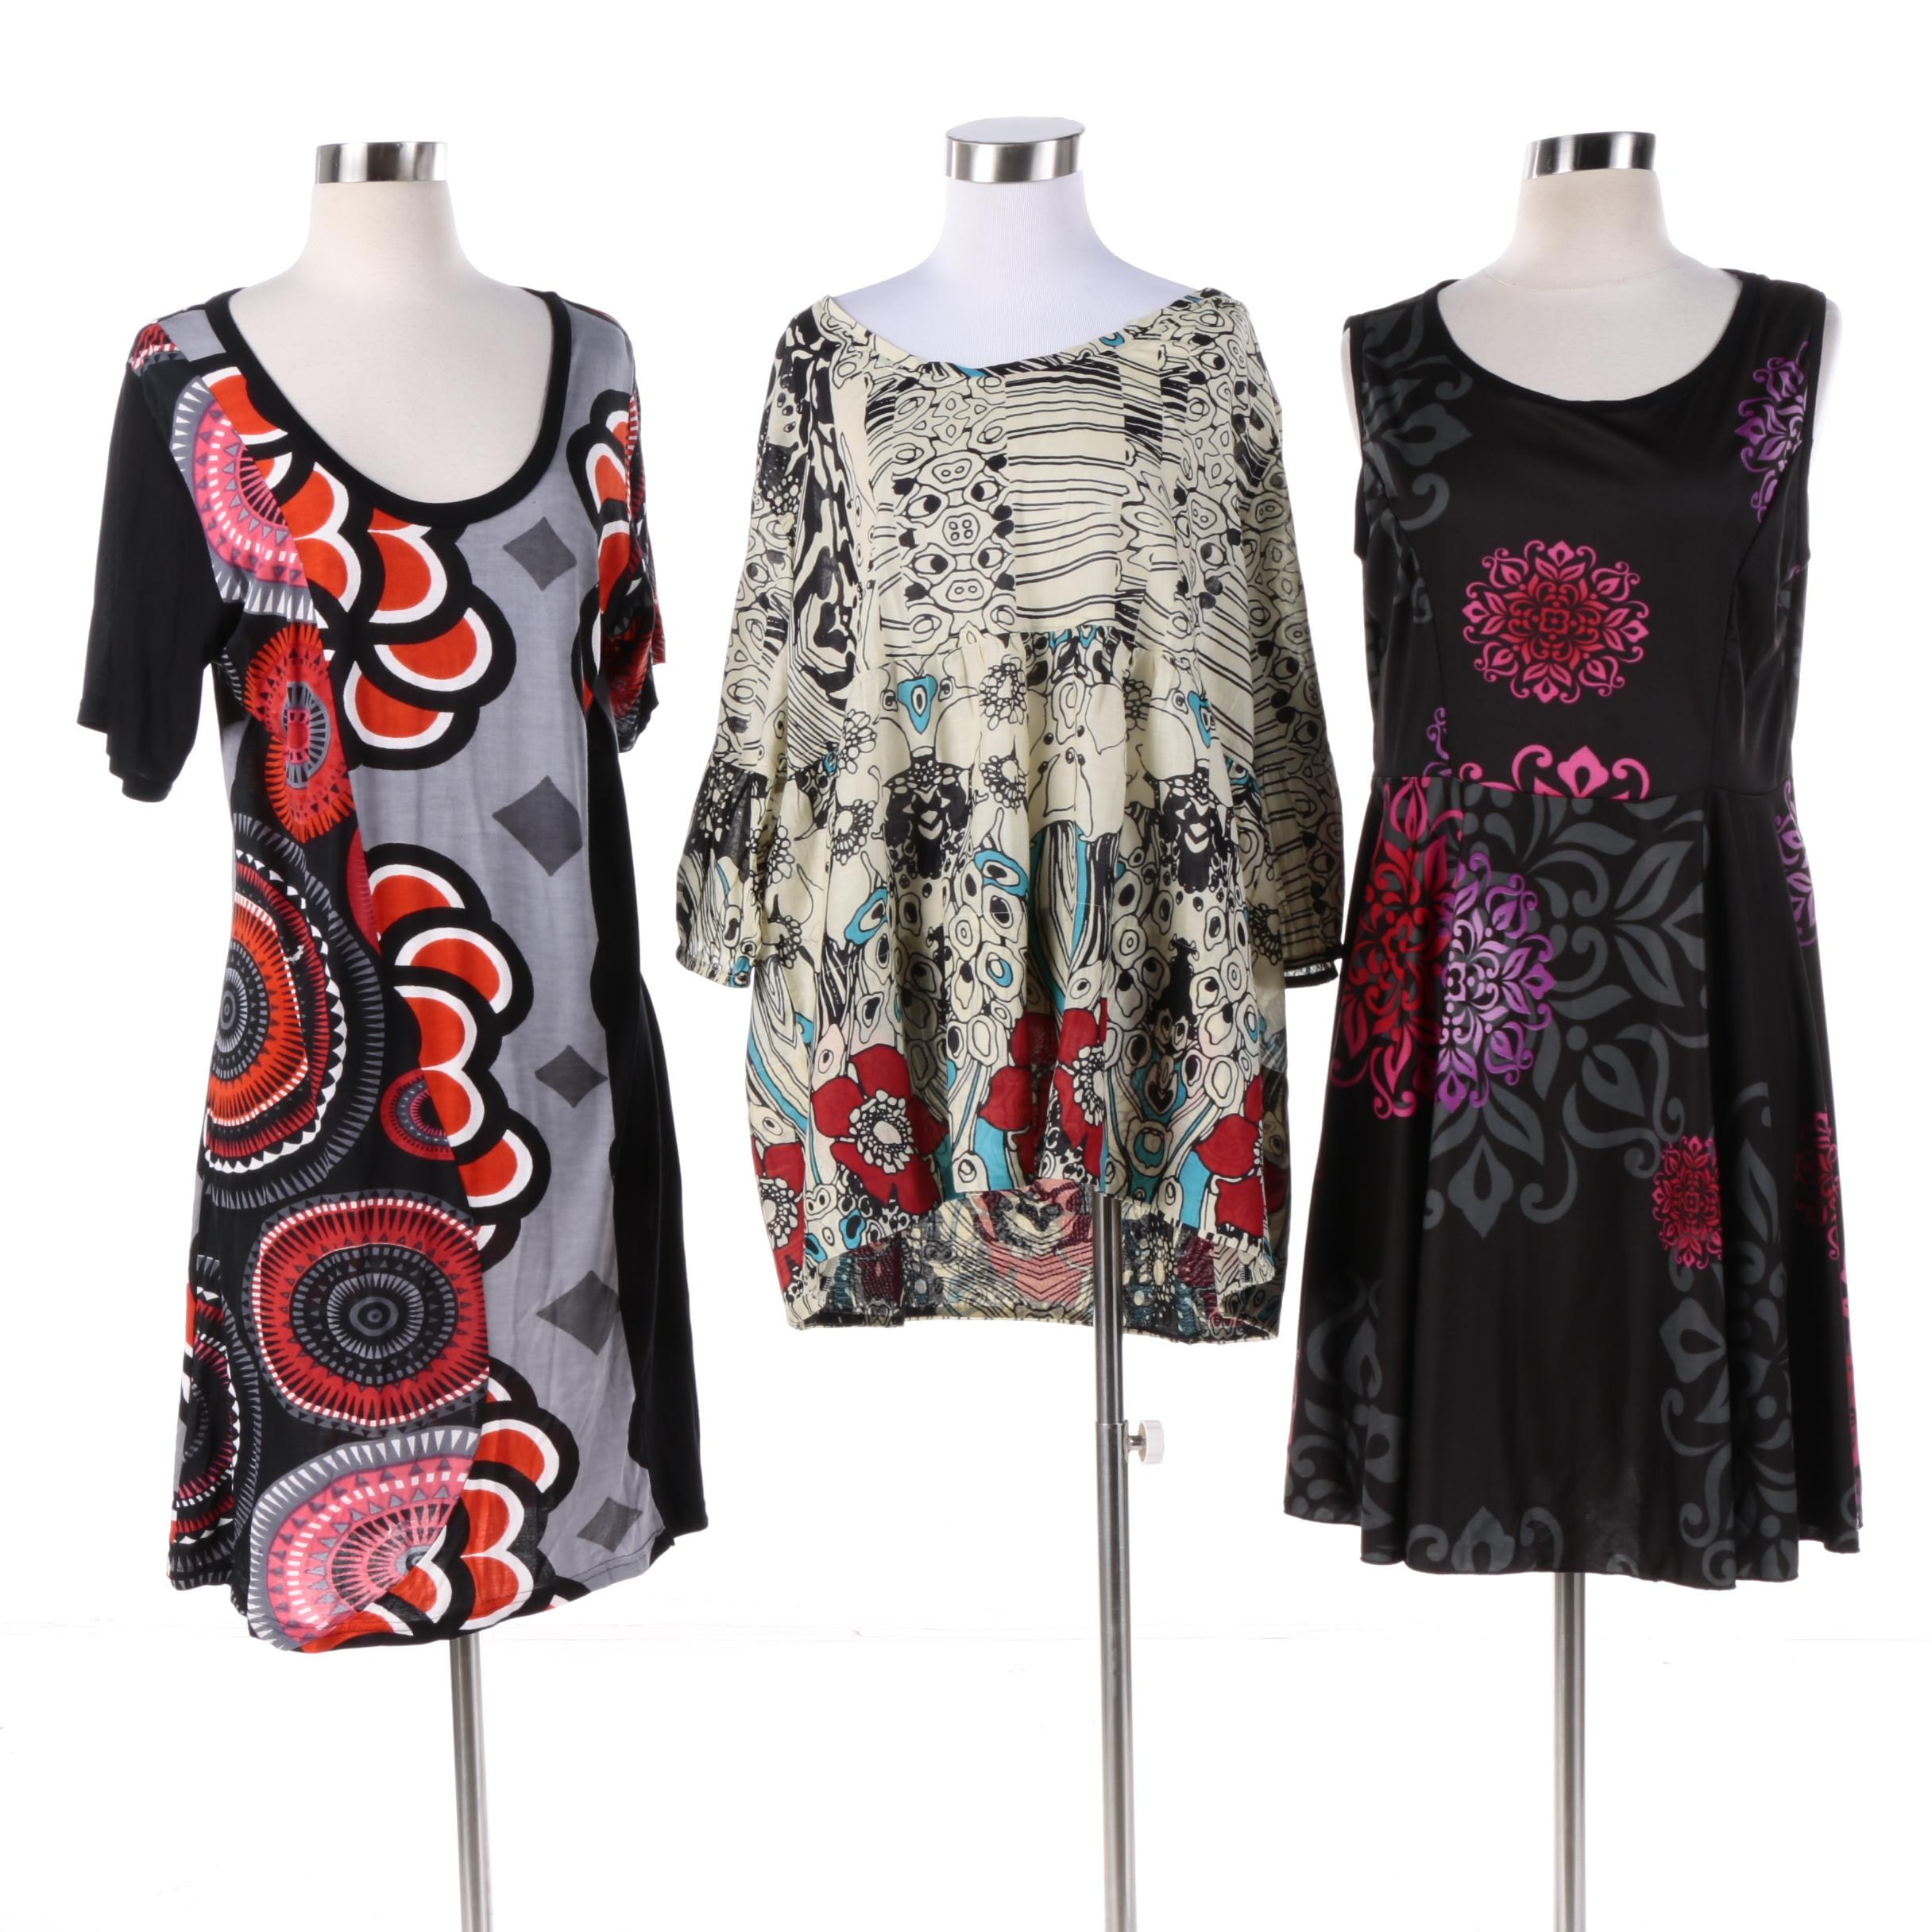 Women's Aller Simplement Dresses and Shirt